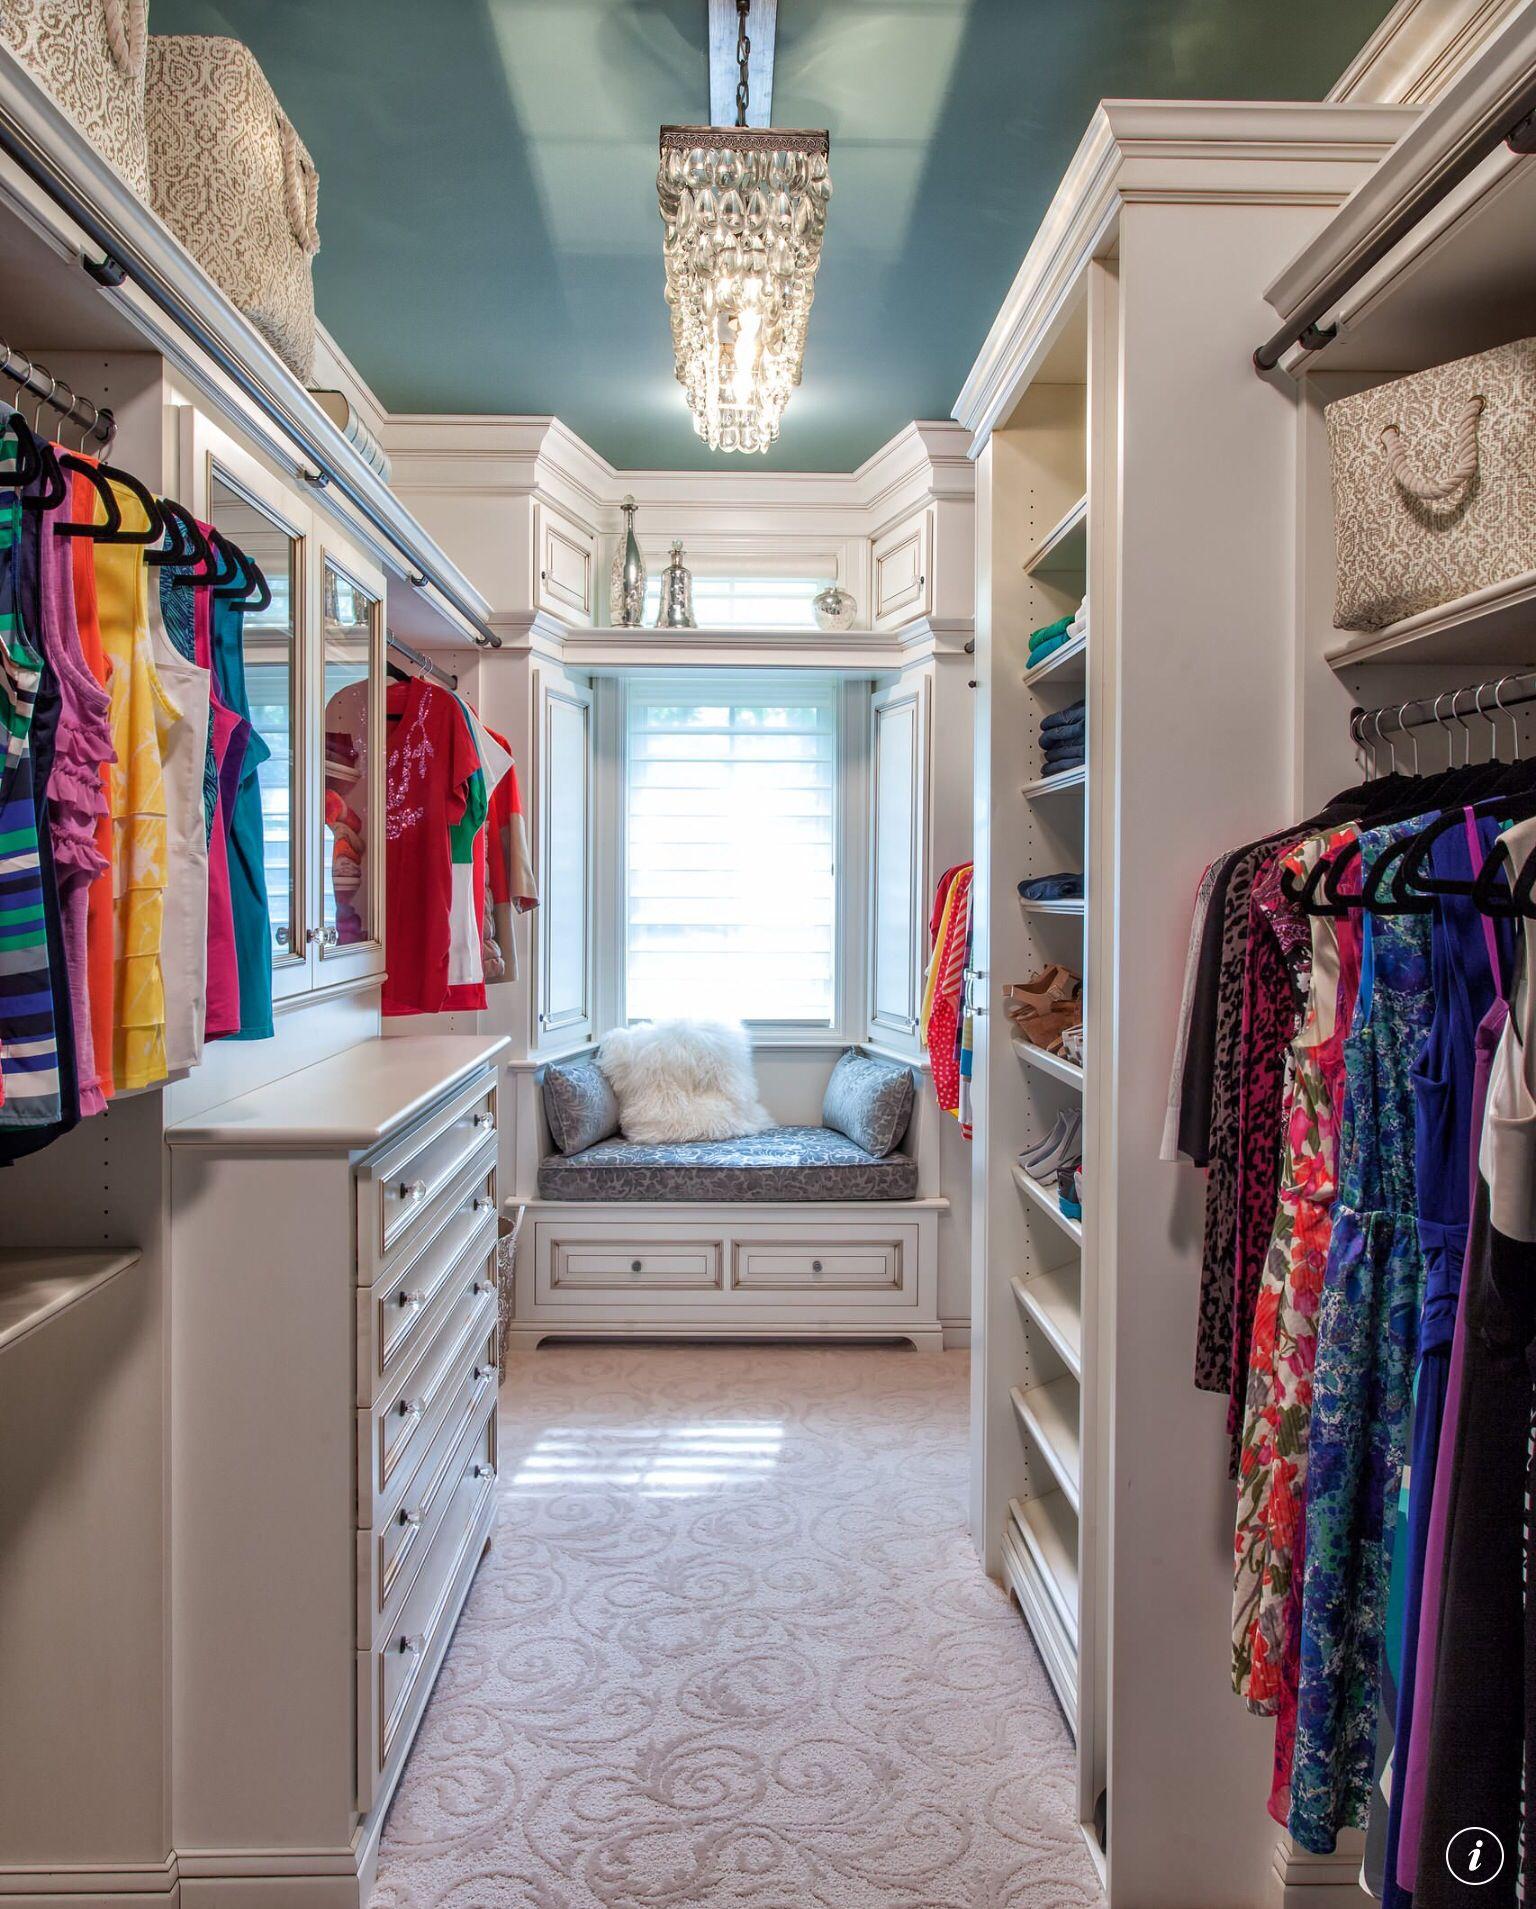 Pin by Katherine Wilson on DREAMY DECOR Closet design